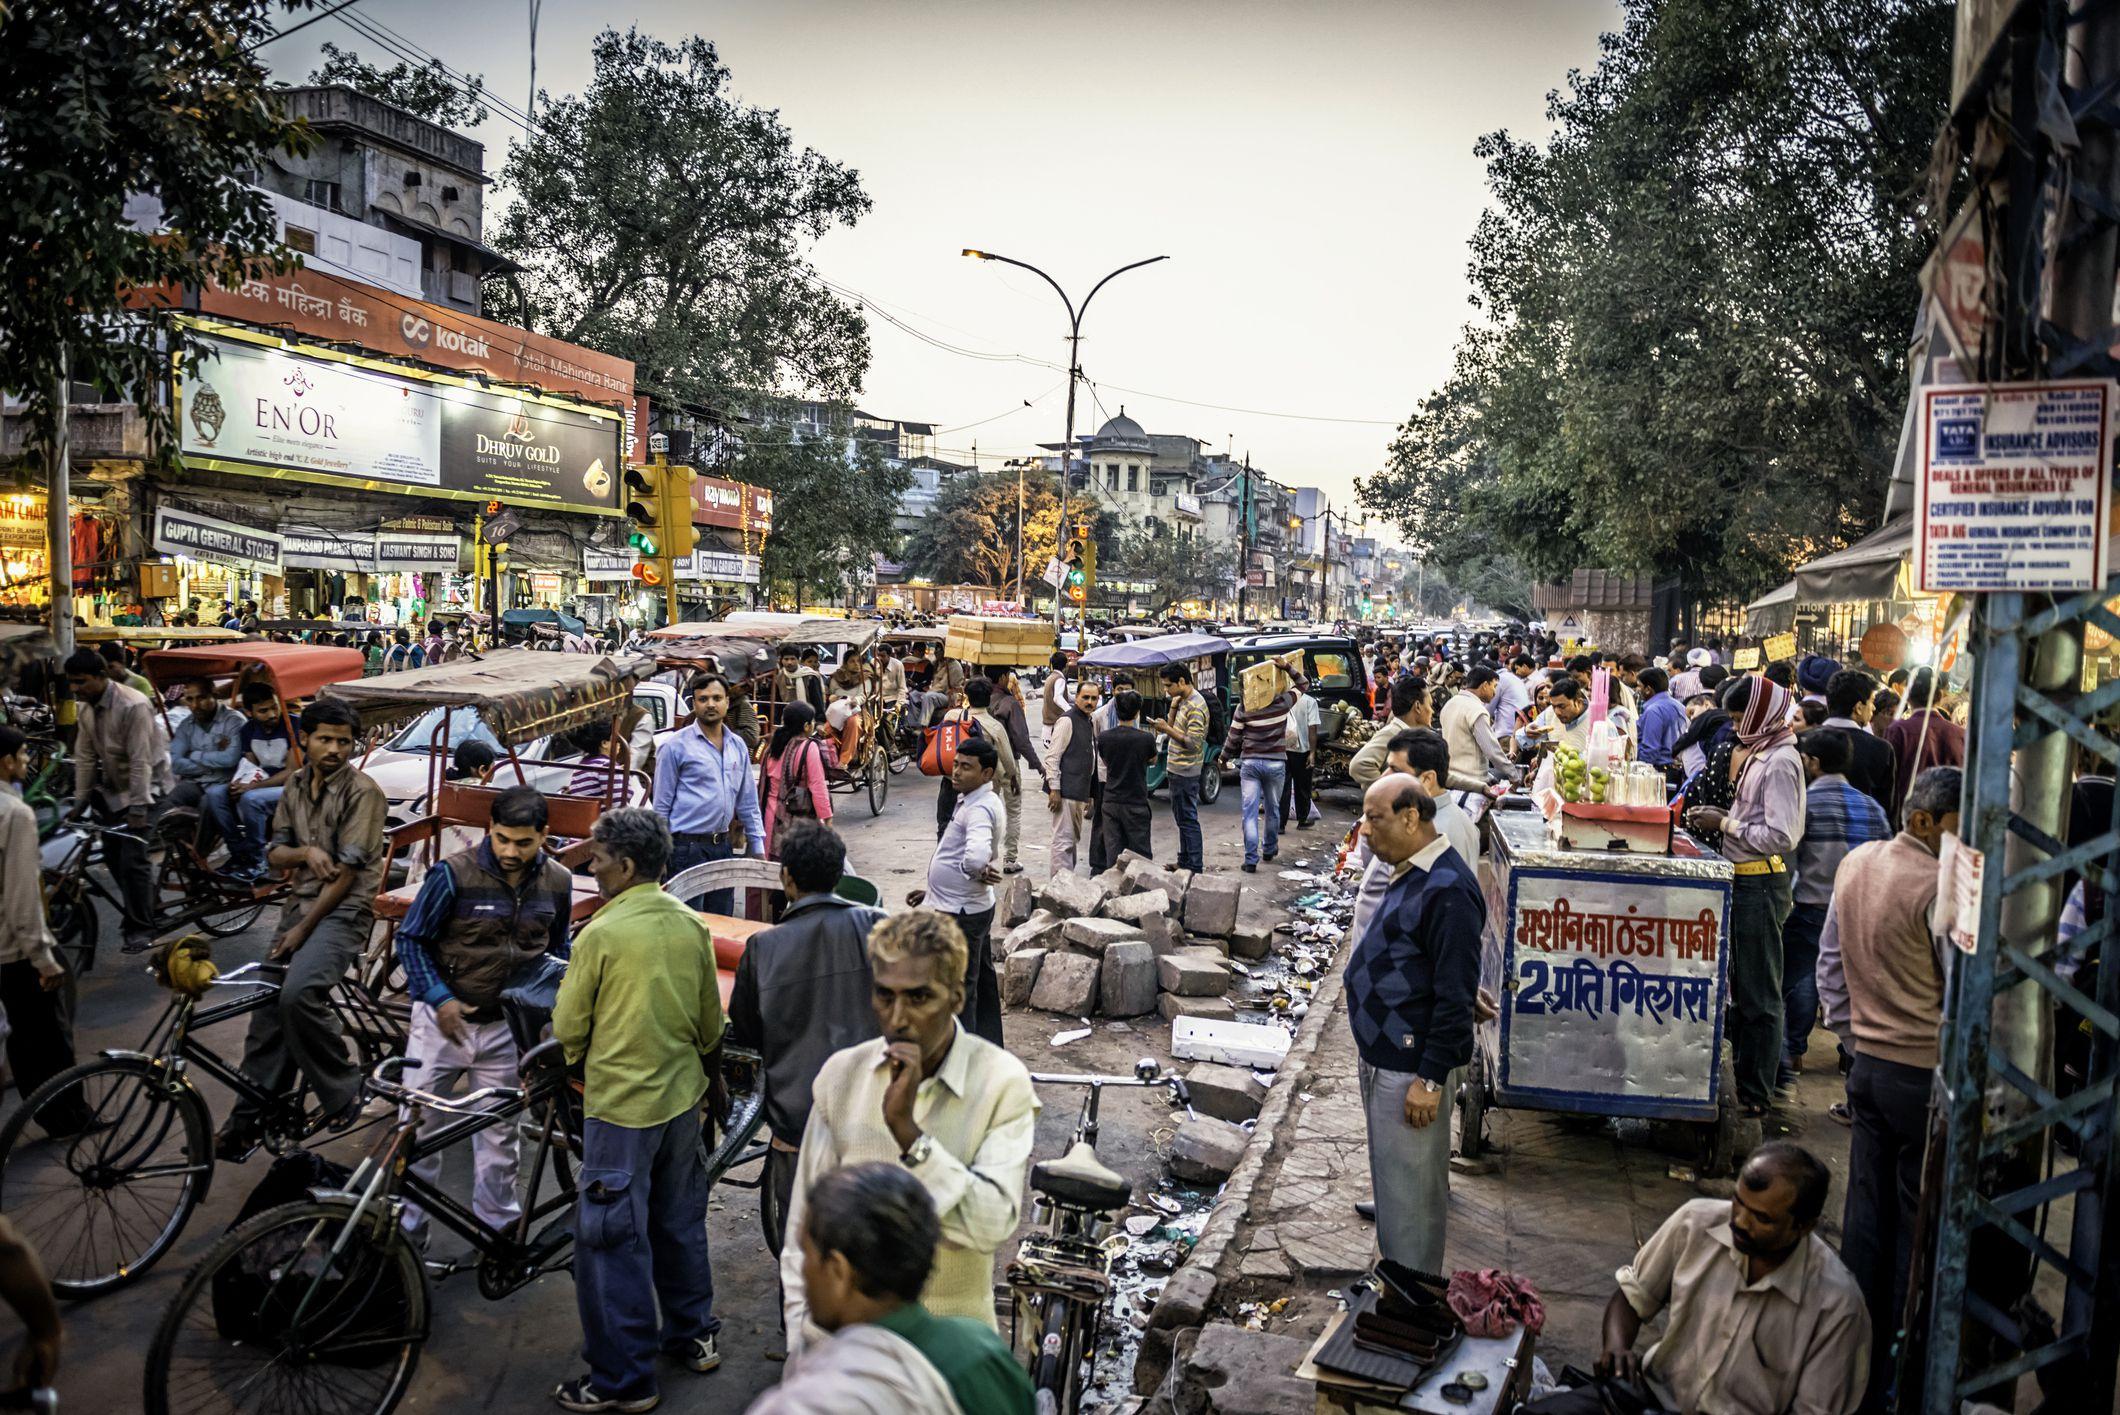 Chandni Chowk in Delhi: The Complete Guide